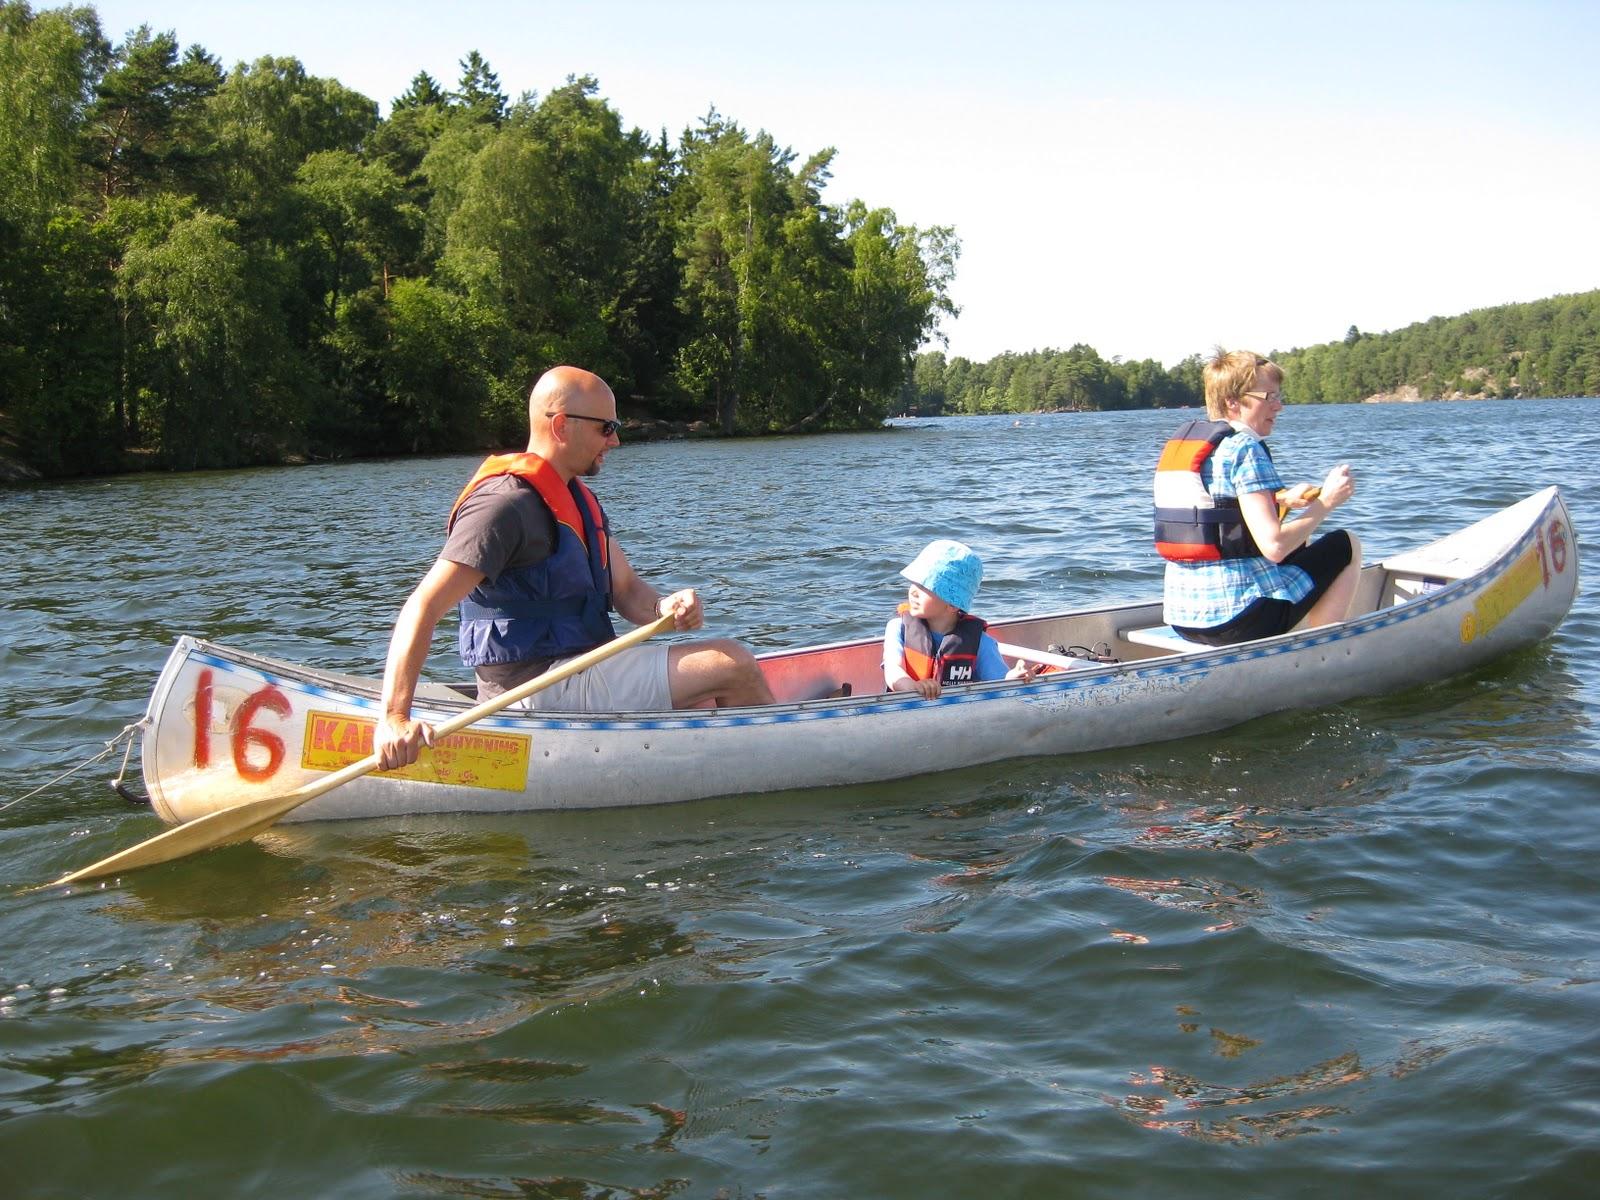 paddla kanot göteborg